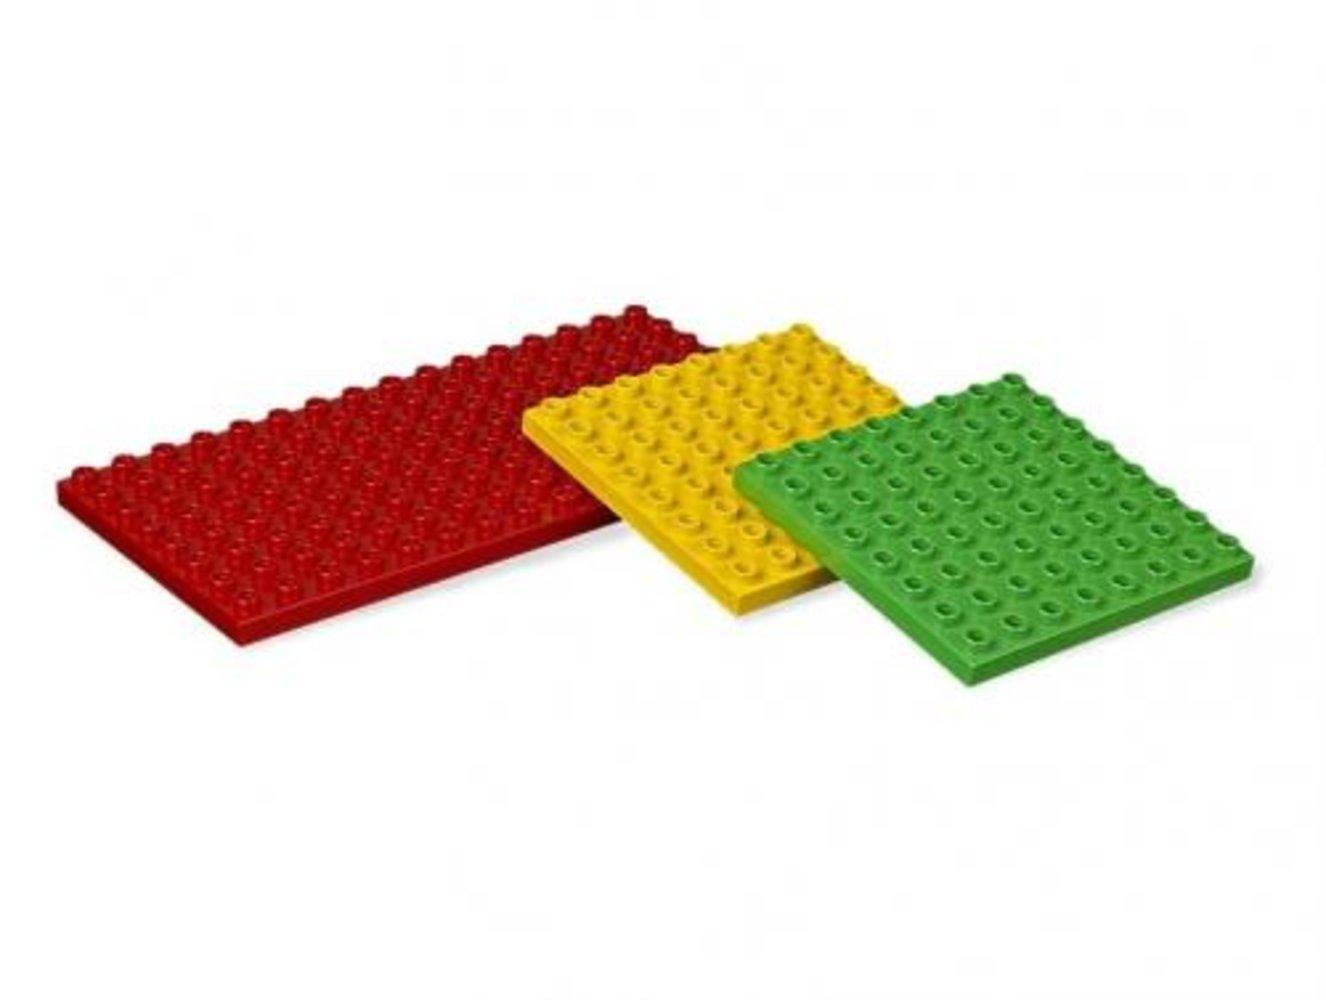 Building Plates